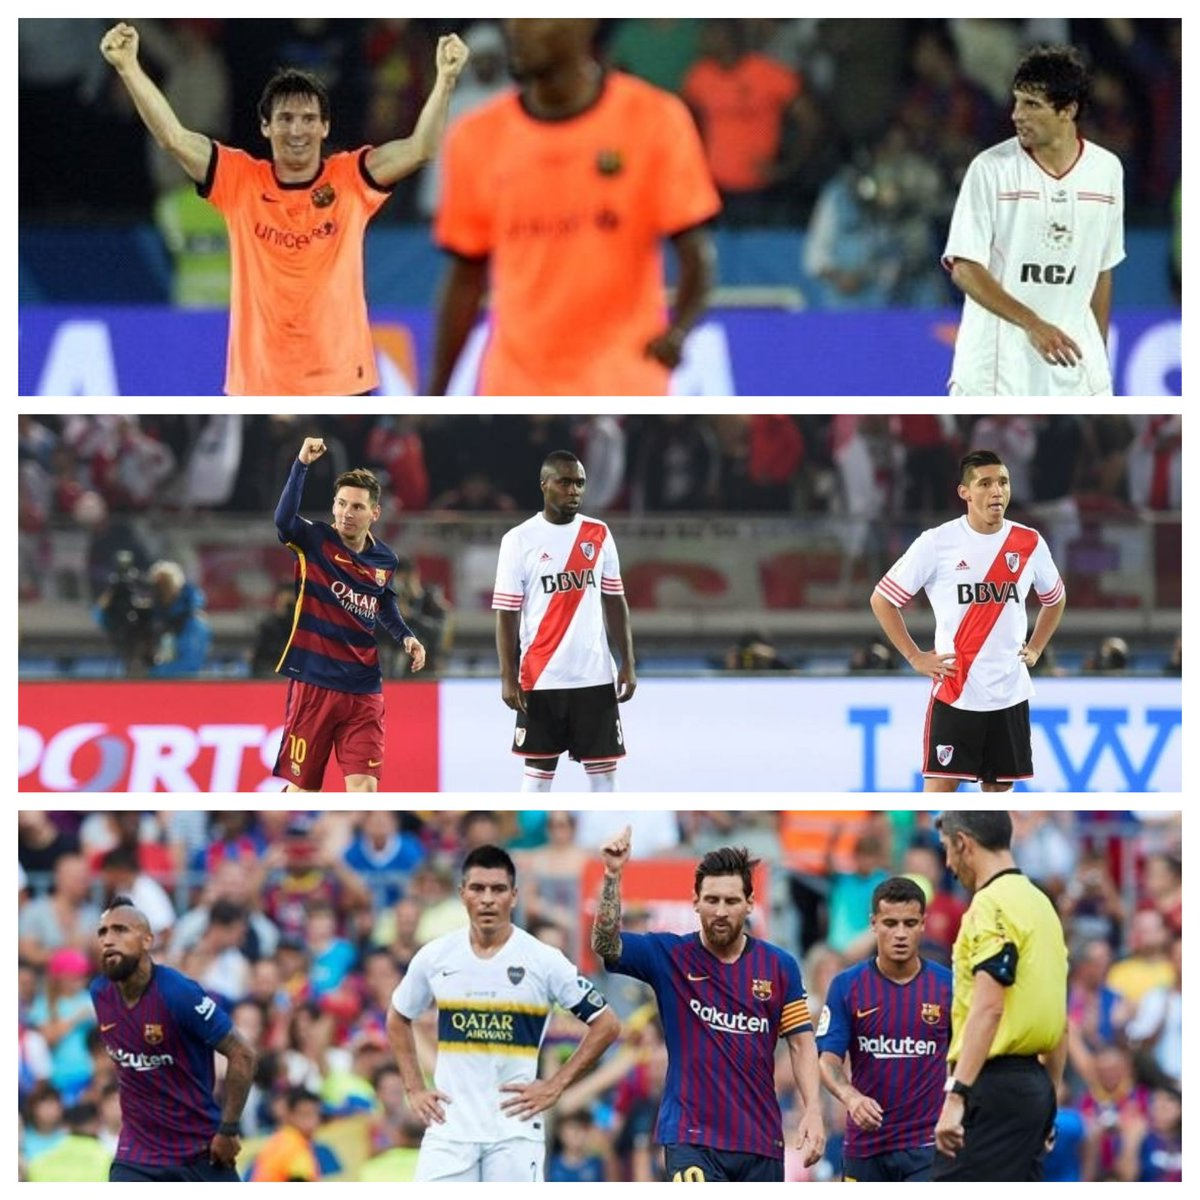 Rodrigo Amor's photo on Messi